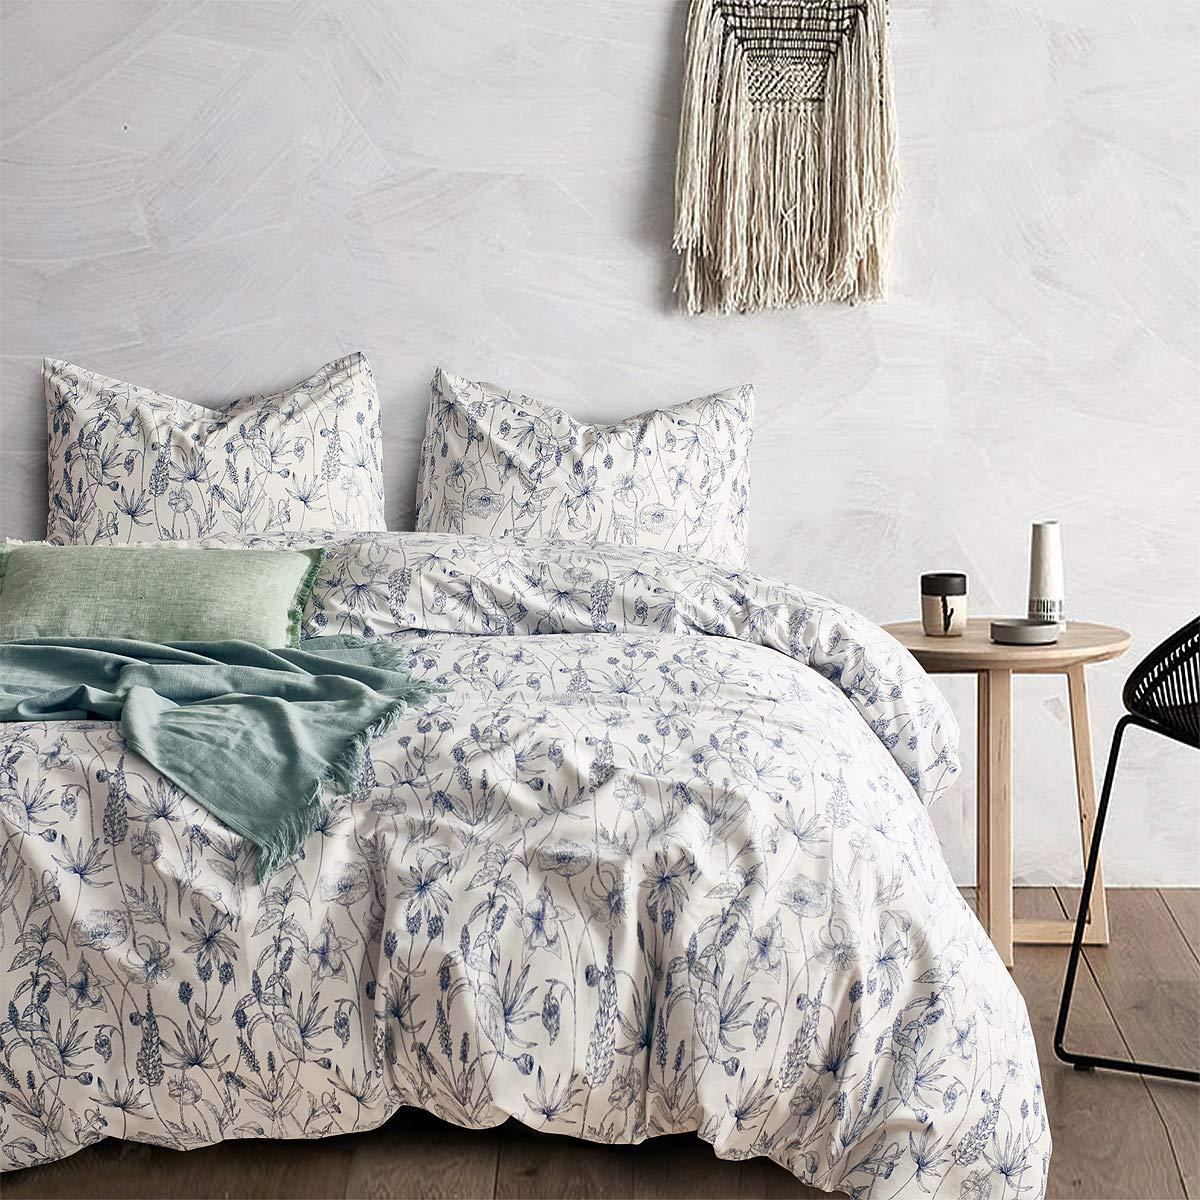 Opcloud Bedding Duvet-Cover-Set,600TC Queen Cotton Luxury Soft Floral Comforter Cover Set,1 Duvet Cover and 2 Pillow Shams Bedding-Set